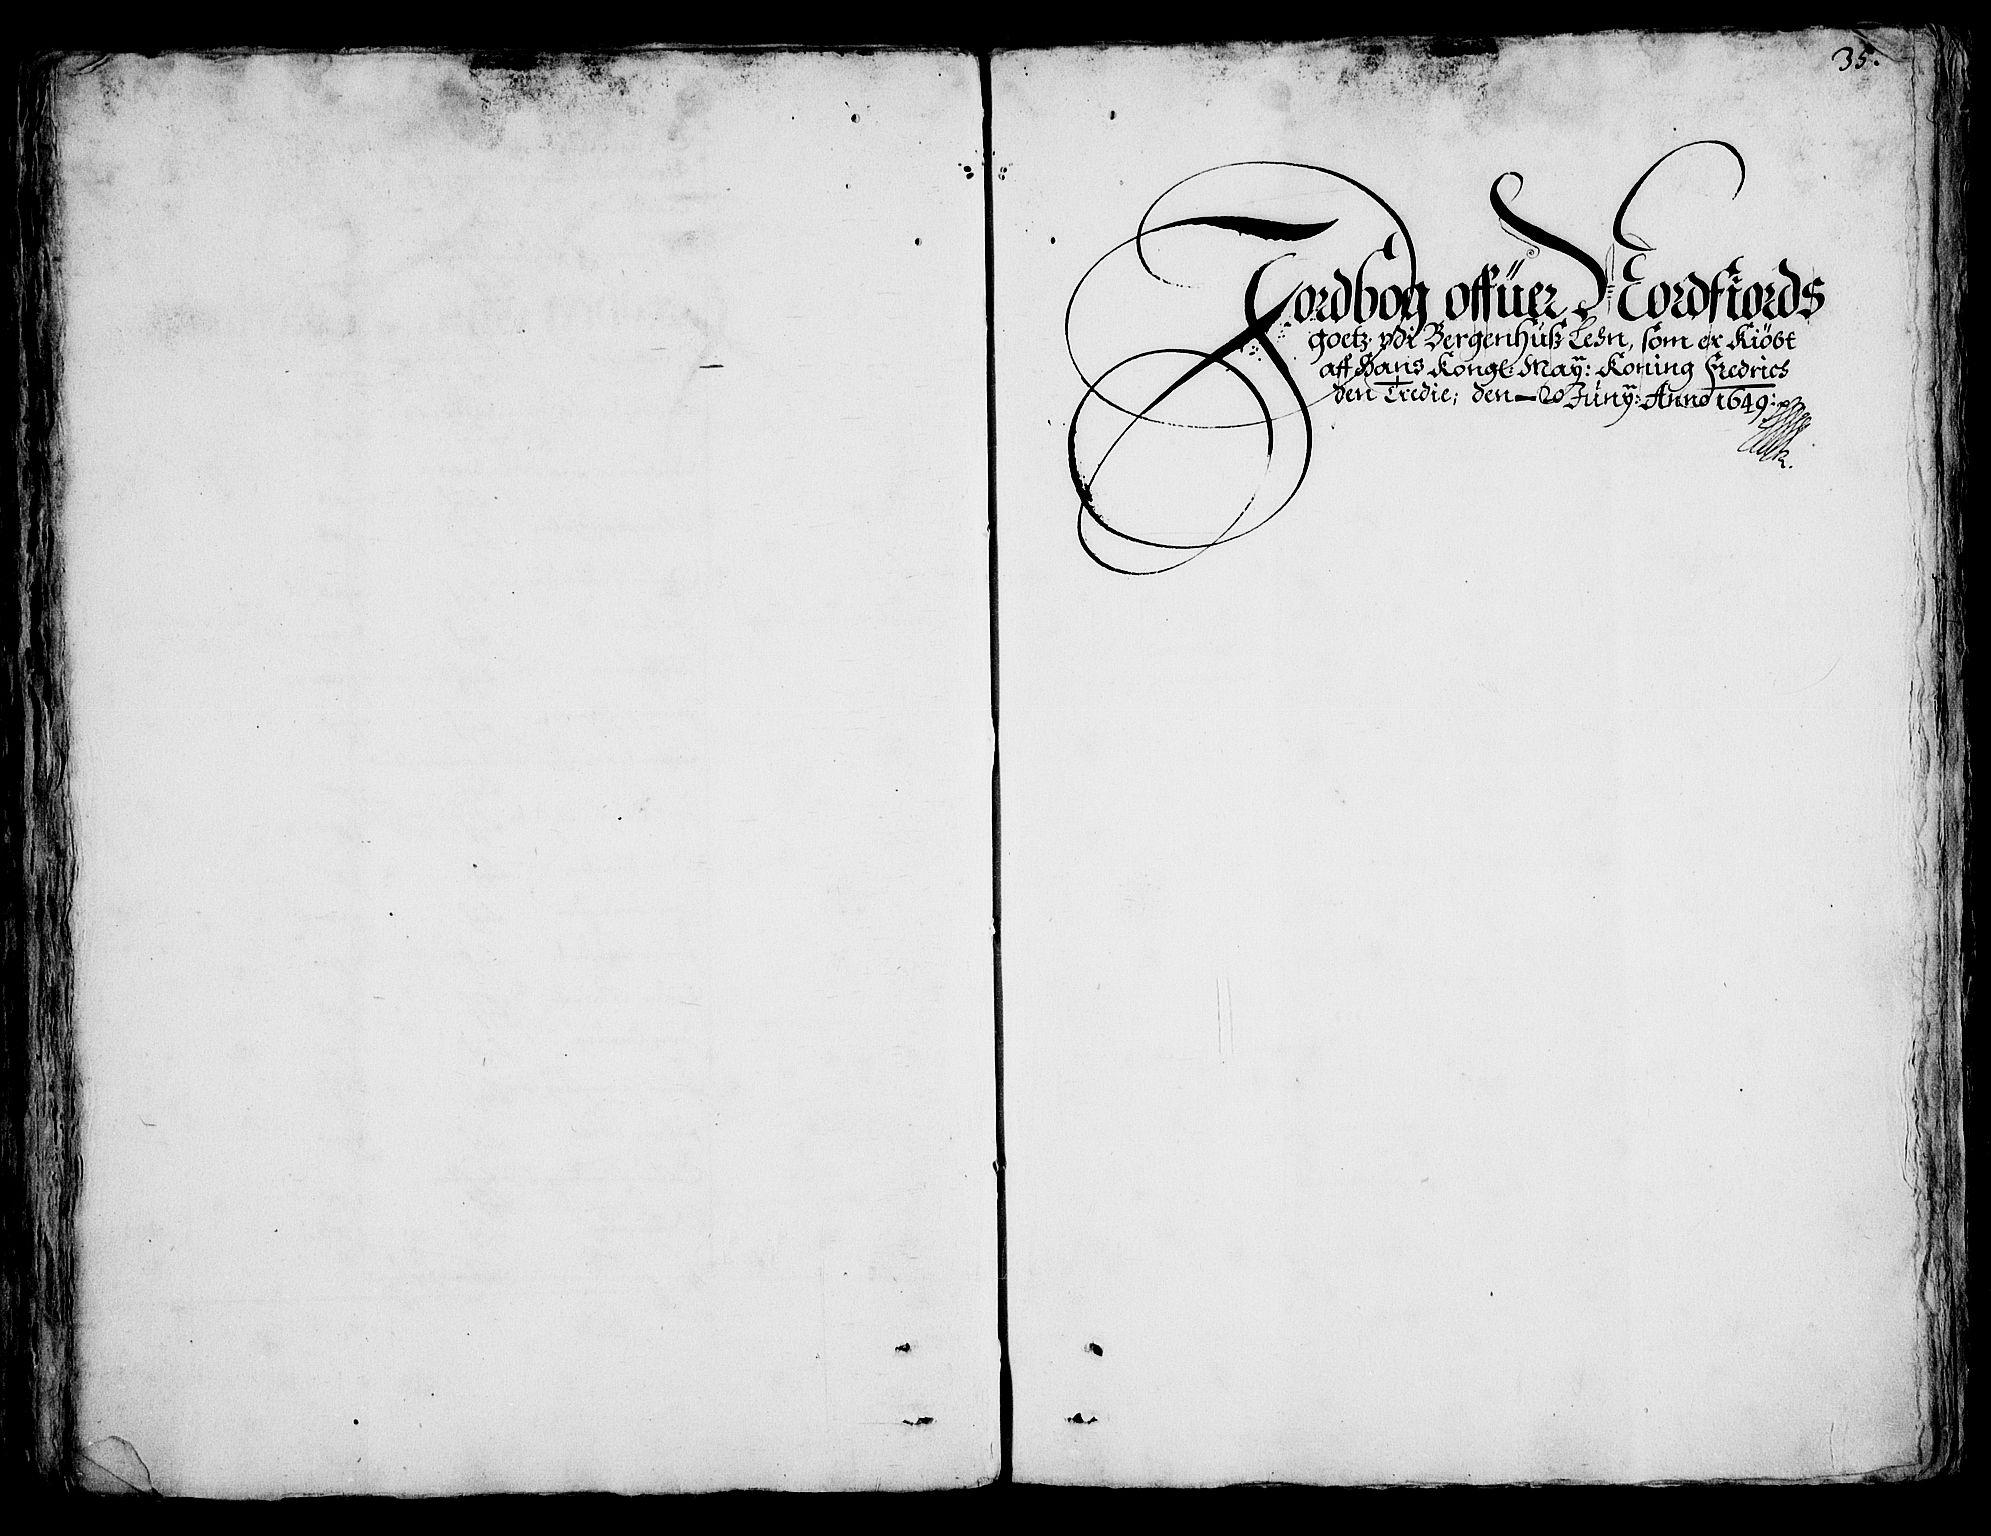 RA, Rentekammeret inntil 1814, Realistisk ordnet avdeling, On/L0001: Statens gods, 1651, s. 1034b-1035a